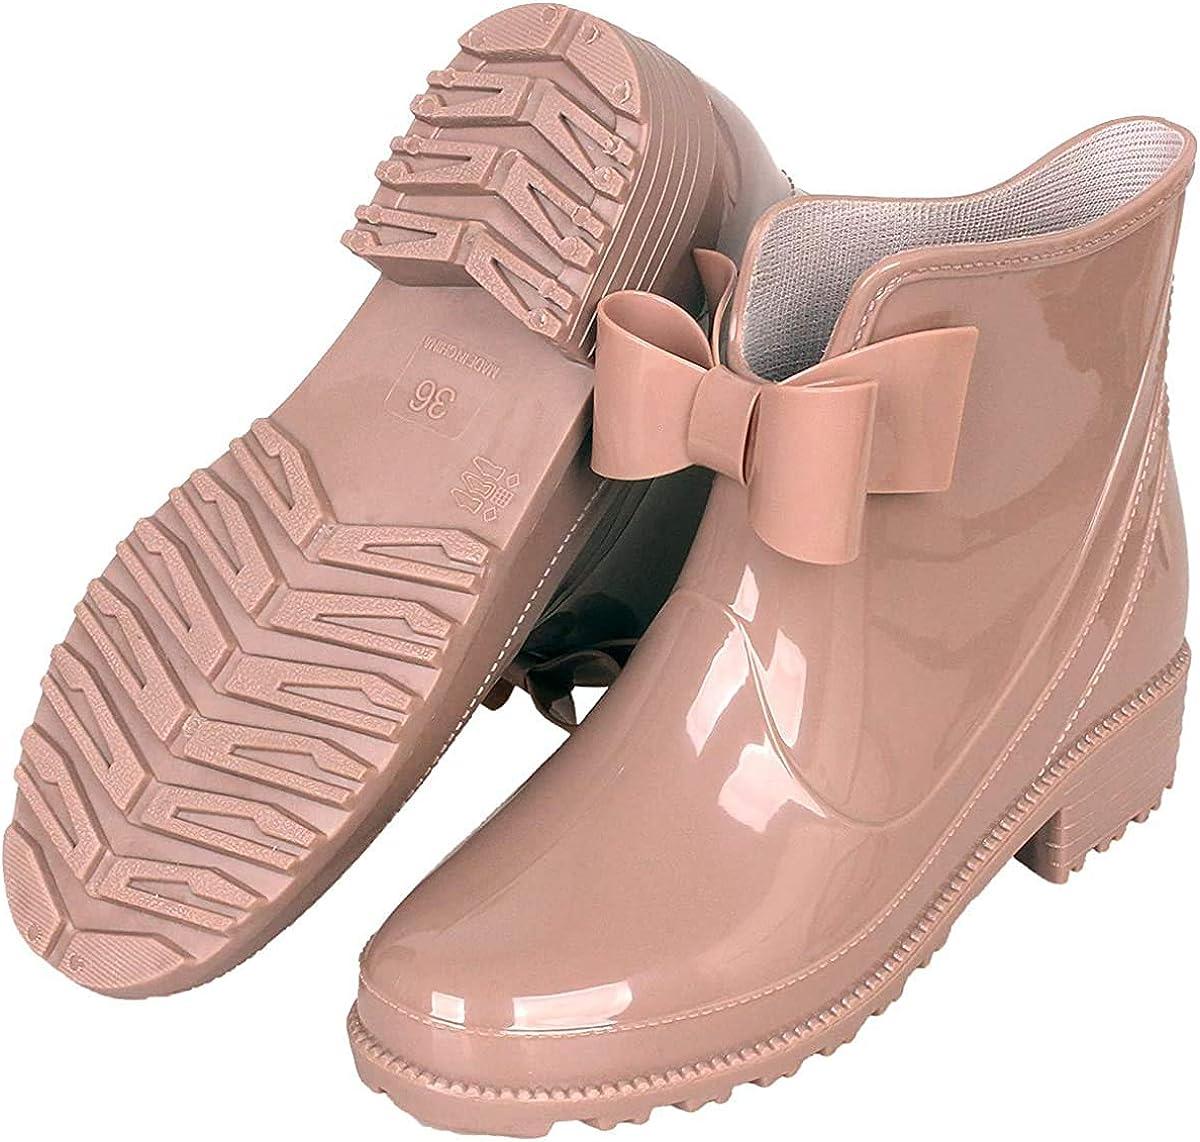 The Best All Day Wear Women Quality Garden Boots